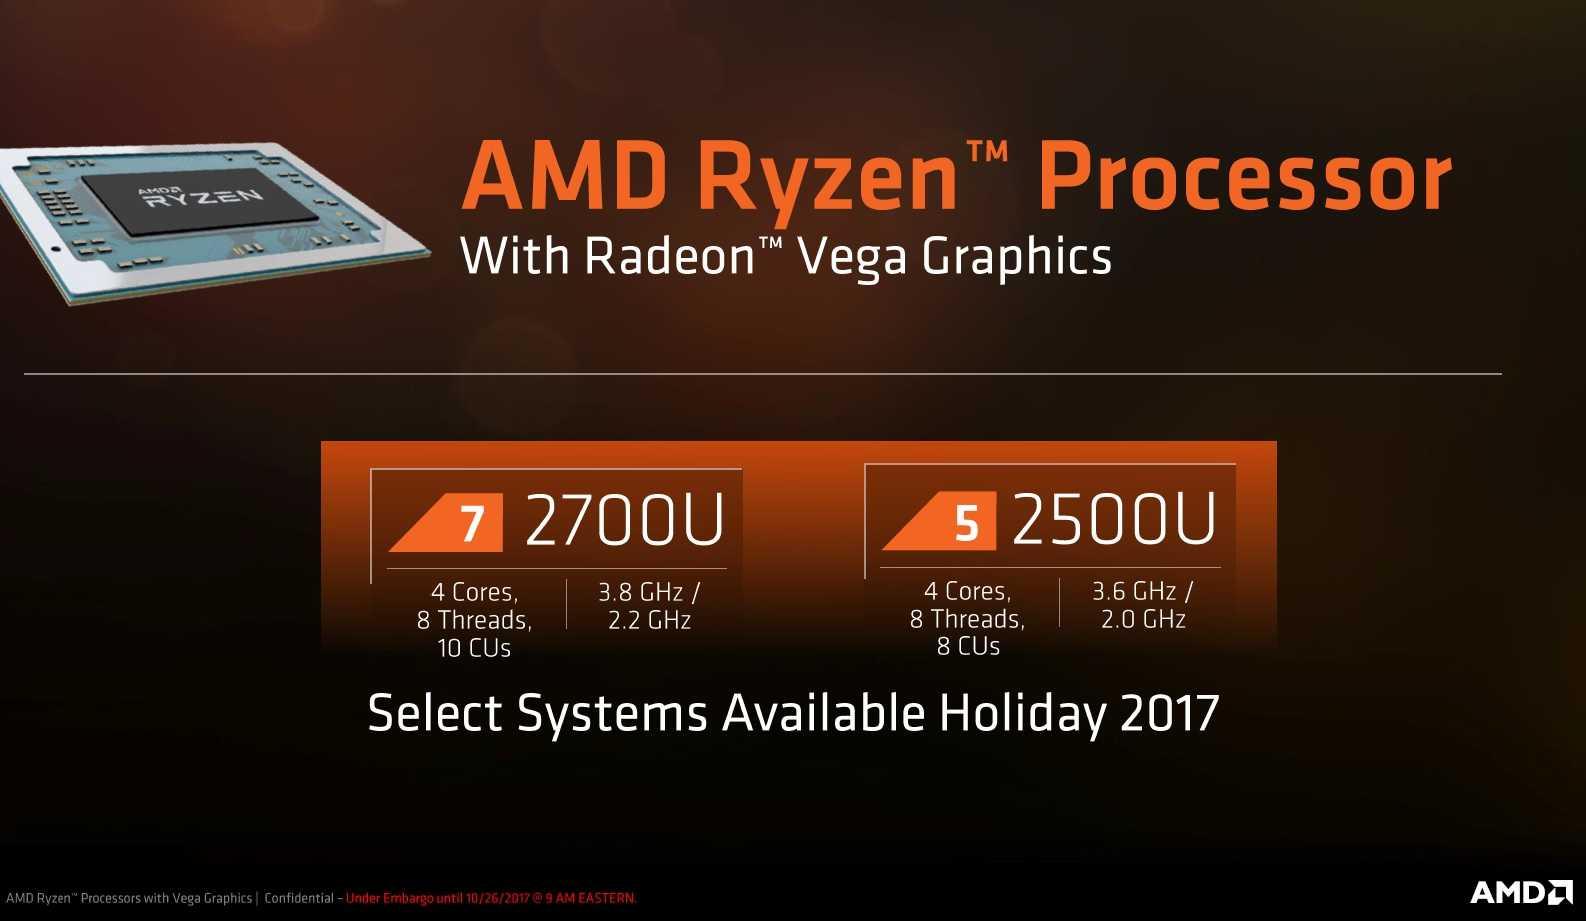 AMD Ryzen with Vega